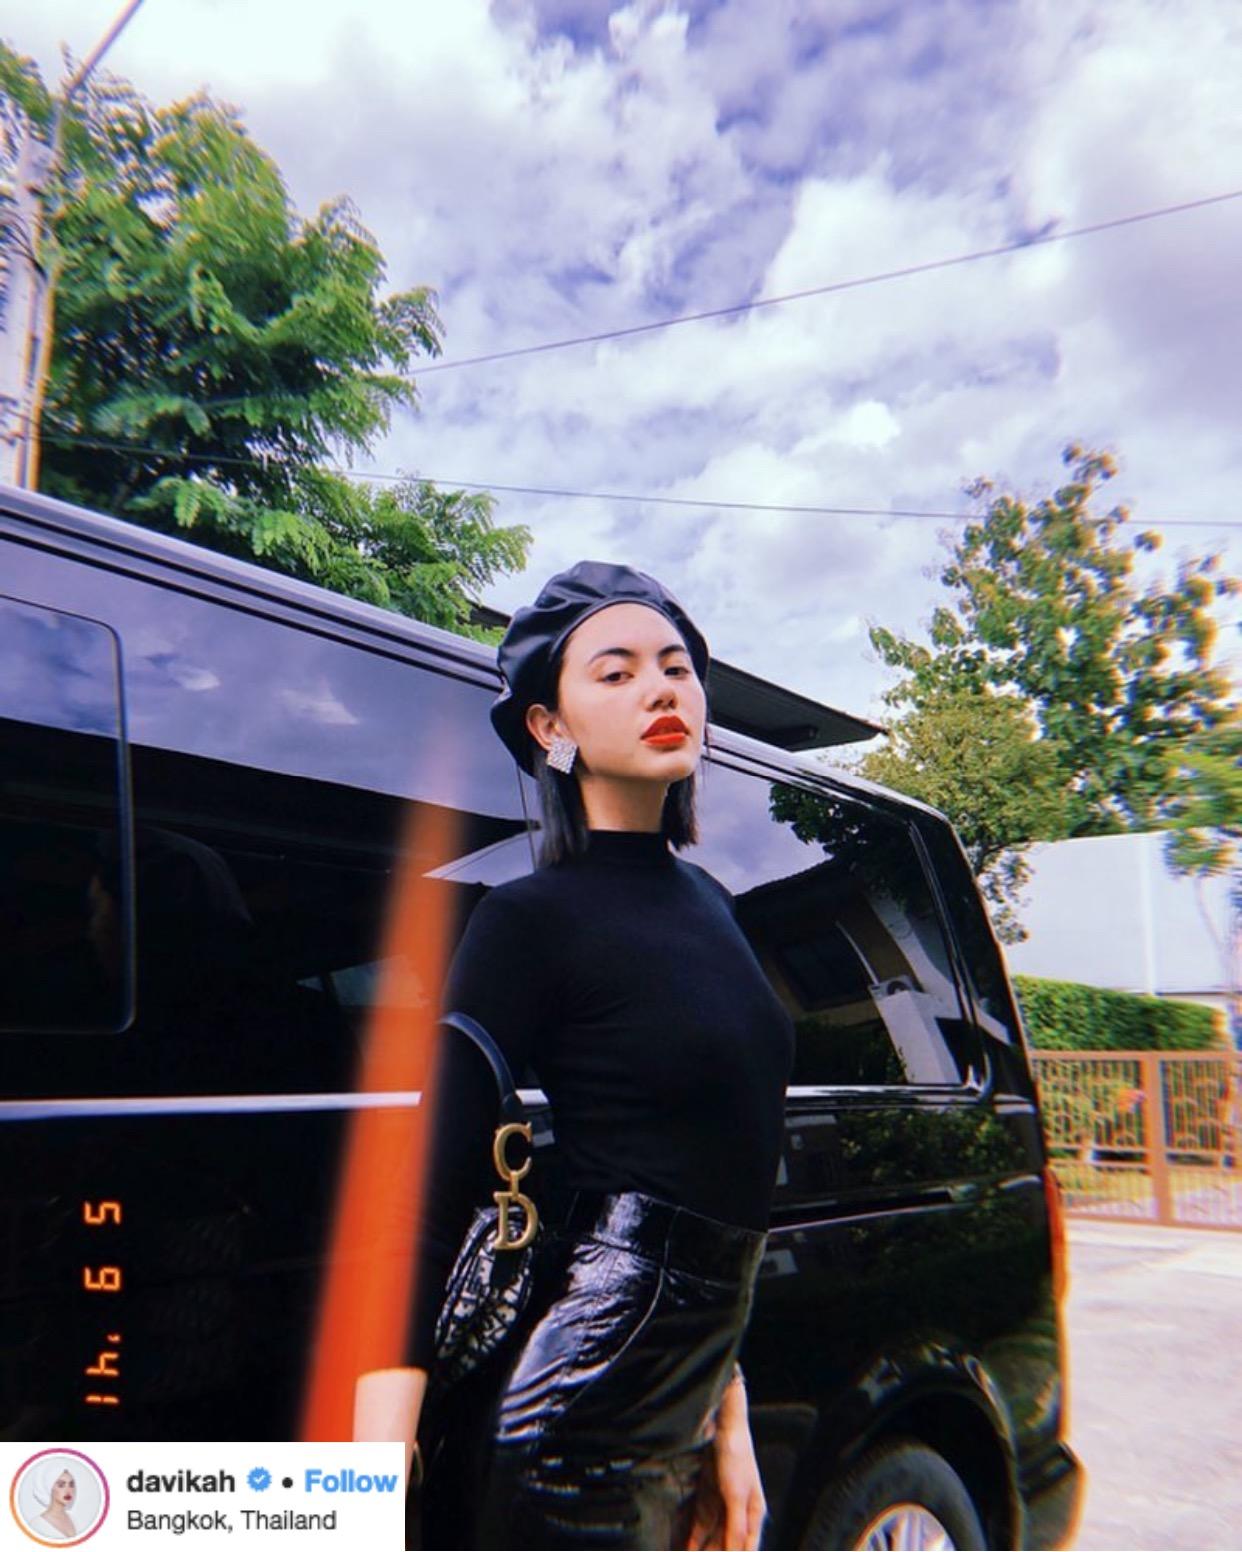 elle việt nam fashionista Thái 11